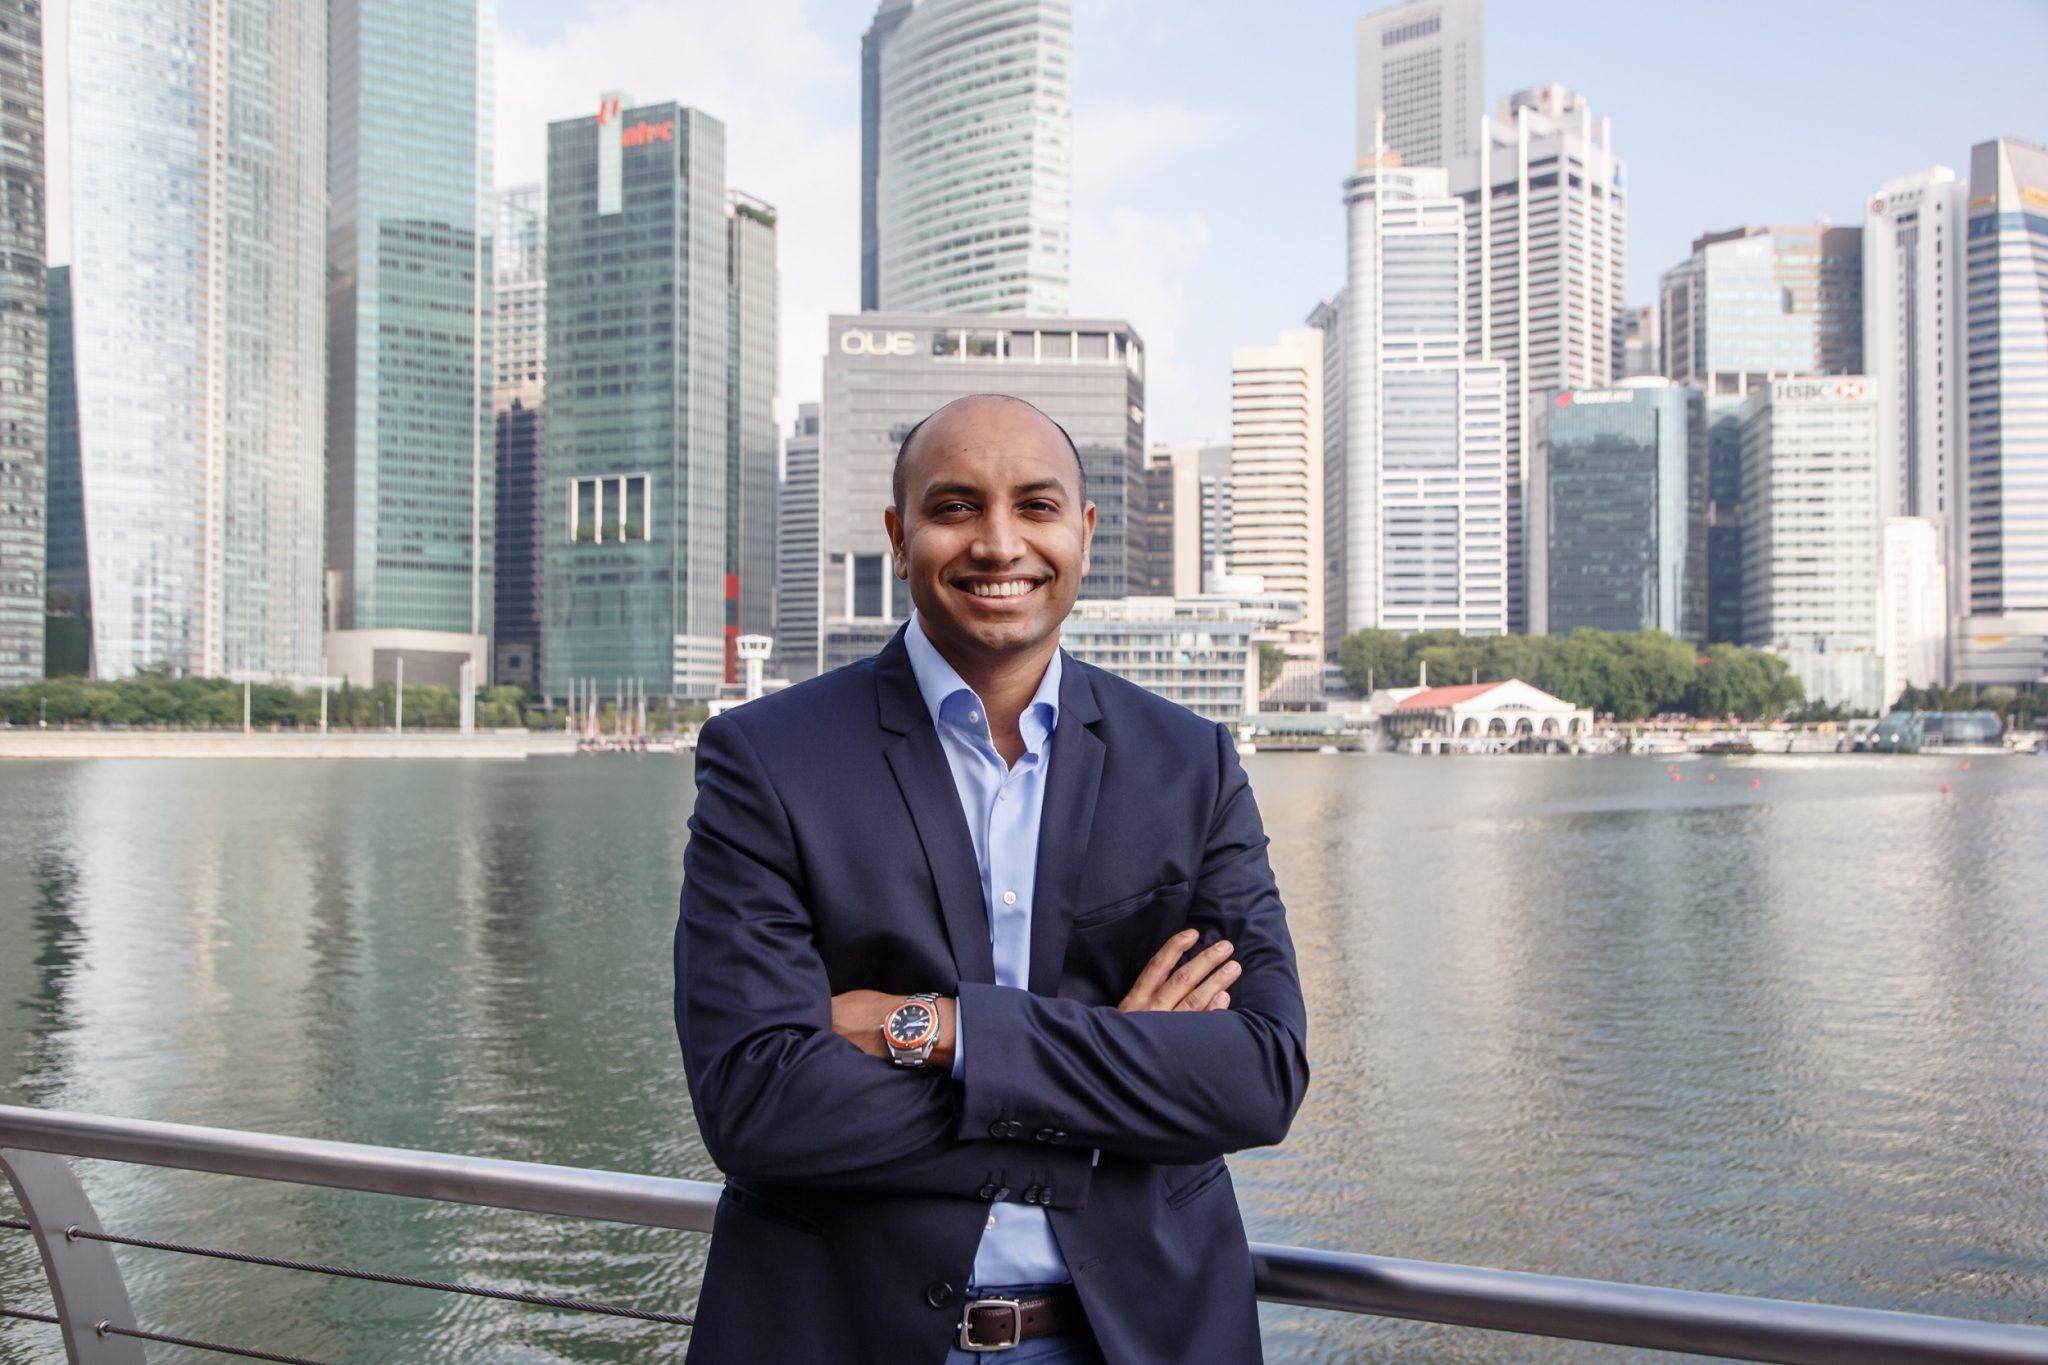 Nium's co-founder and CEO, Prajit Nanu